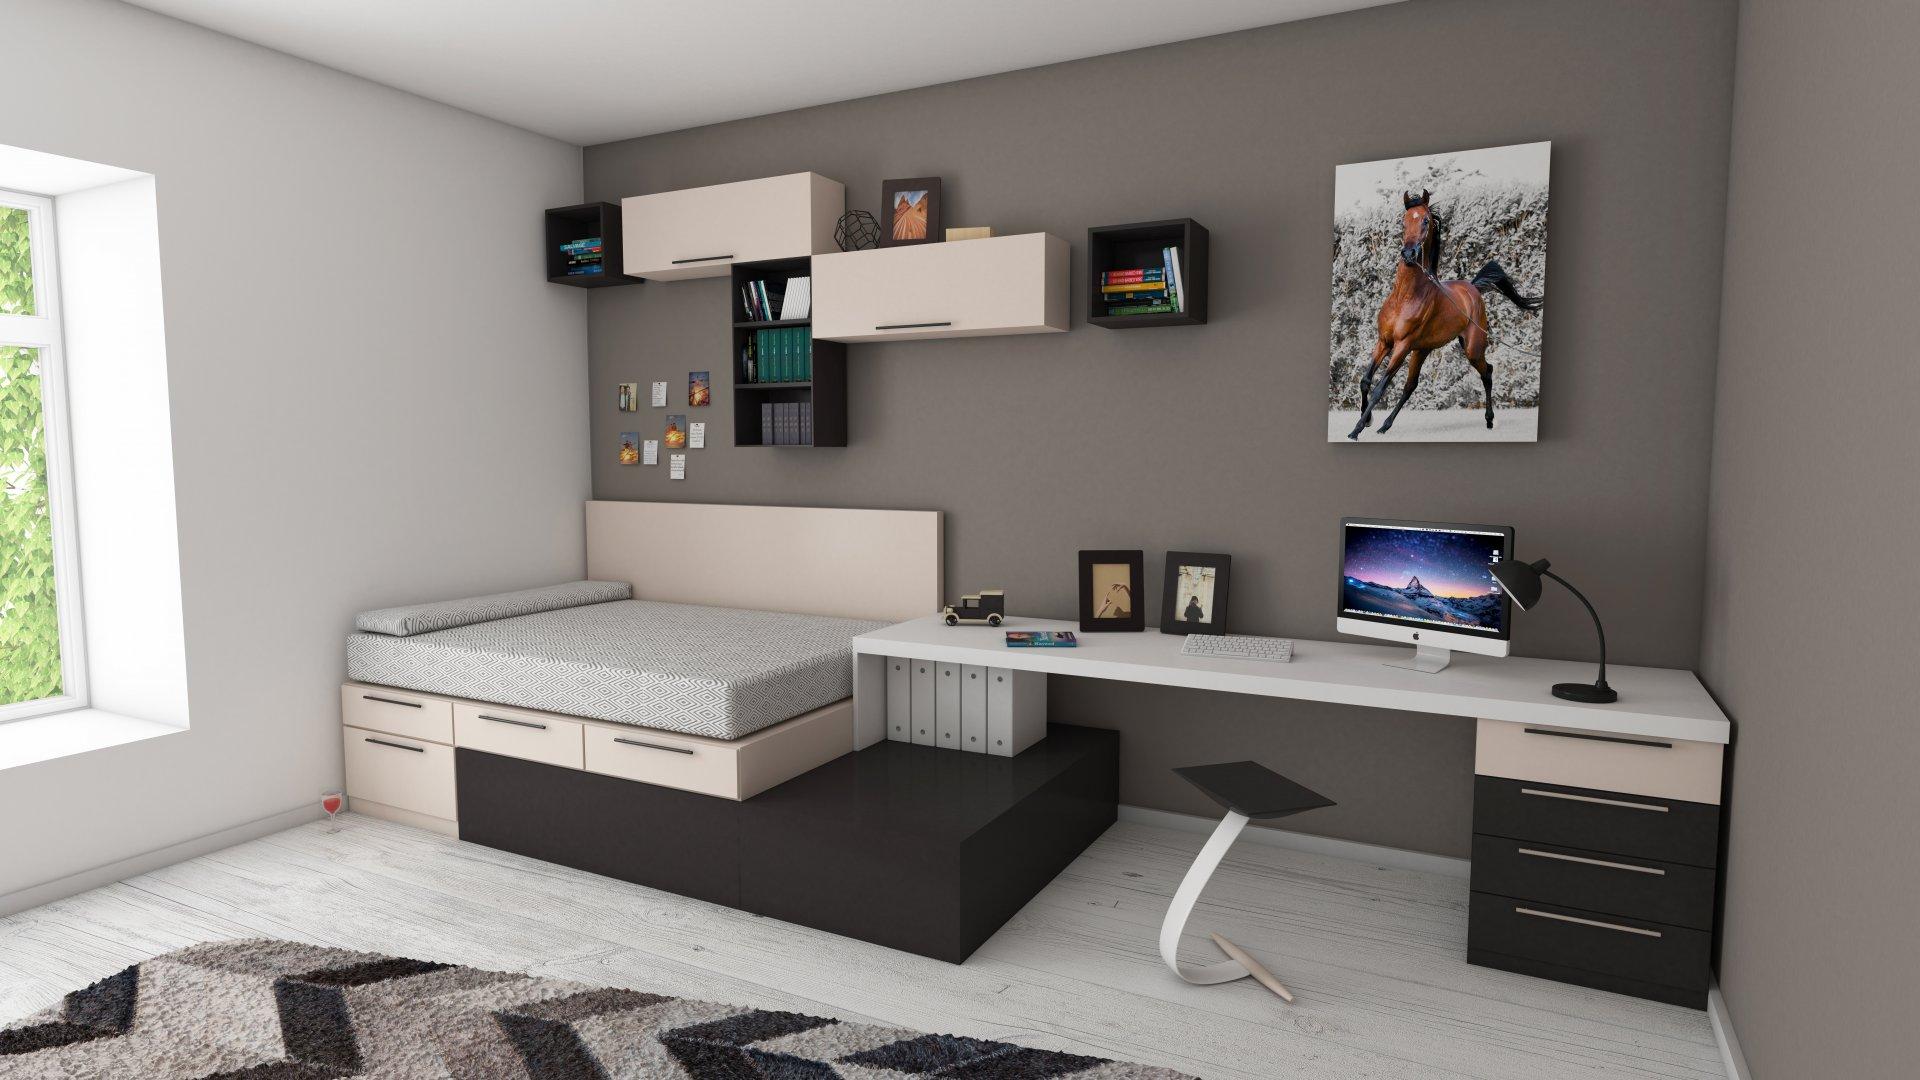 studio apartment bedroom layout